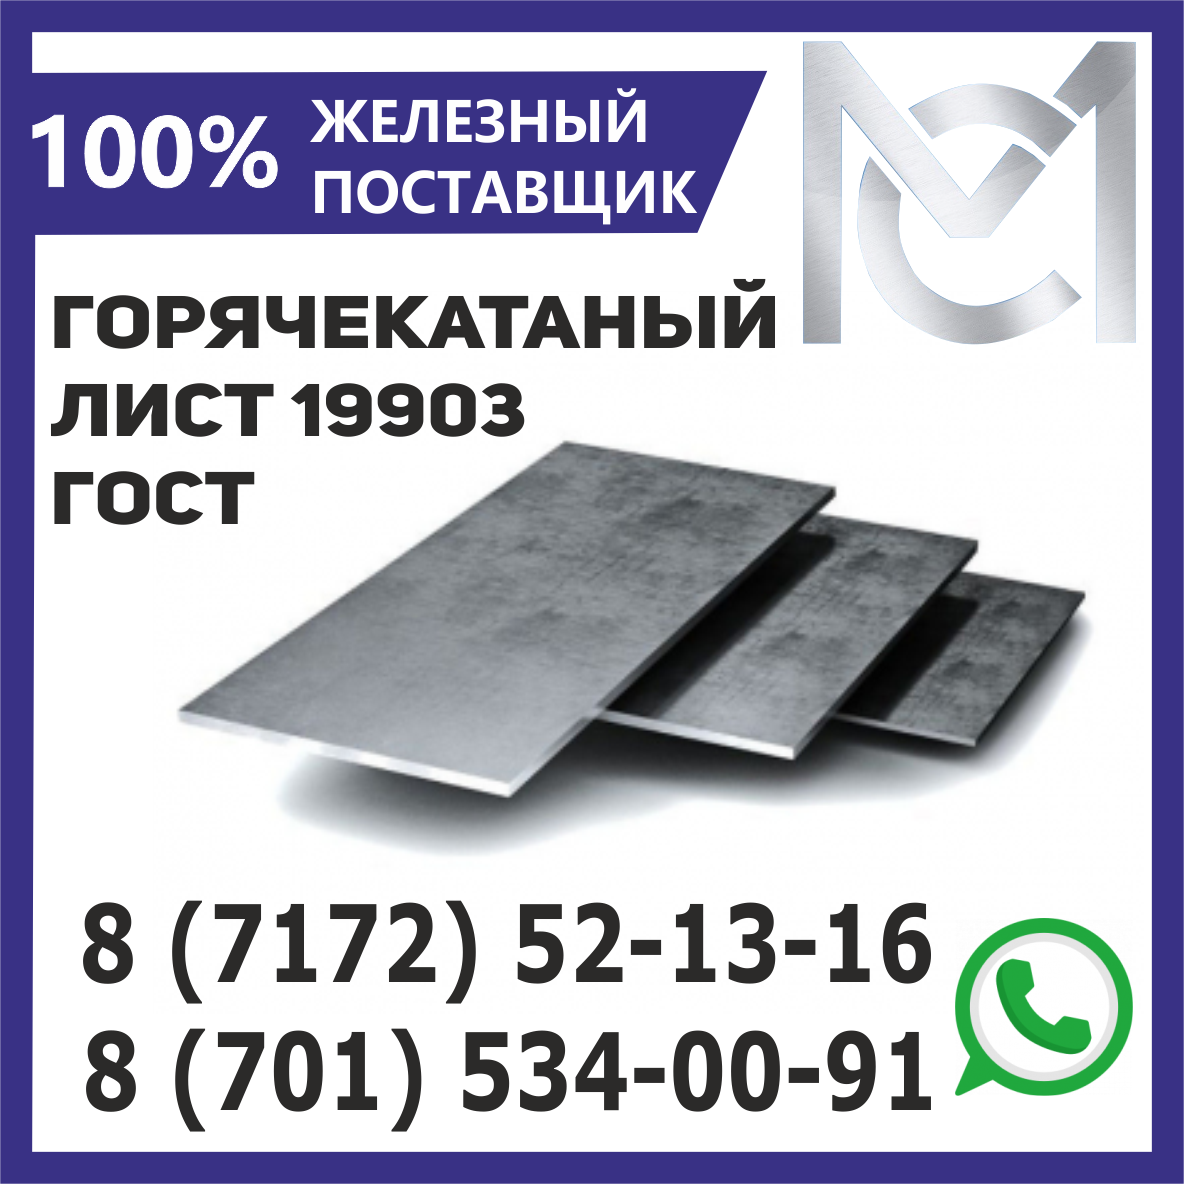 Лист 30 горячекатаный ГОСТ 19903-74, 1,5х6,0 м.